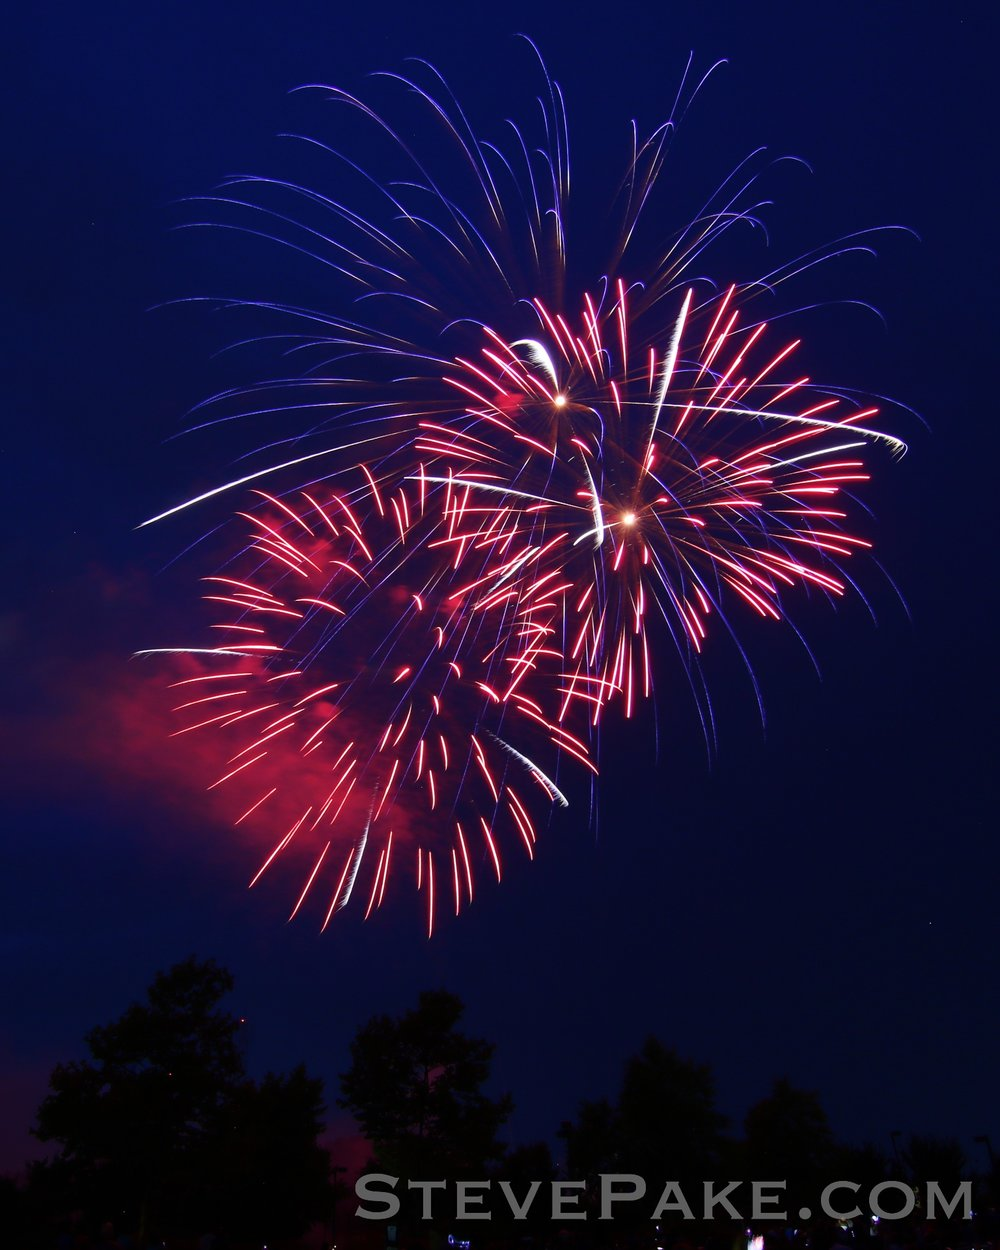 Fireworks2018_19_GE3A8526ap-HD-WM.jpg